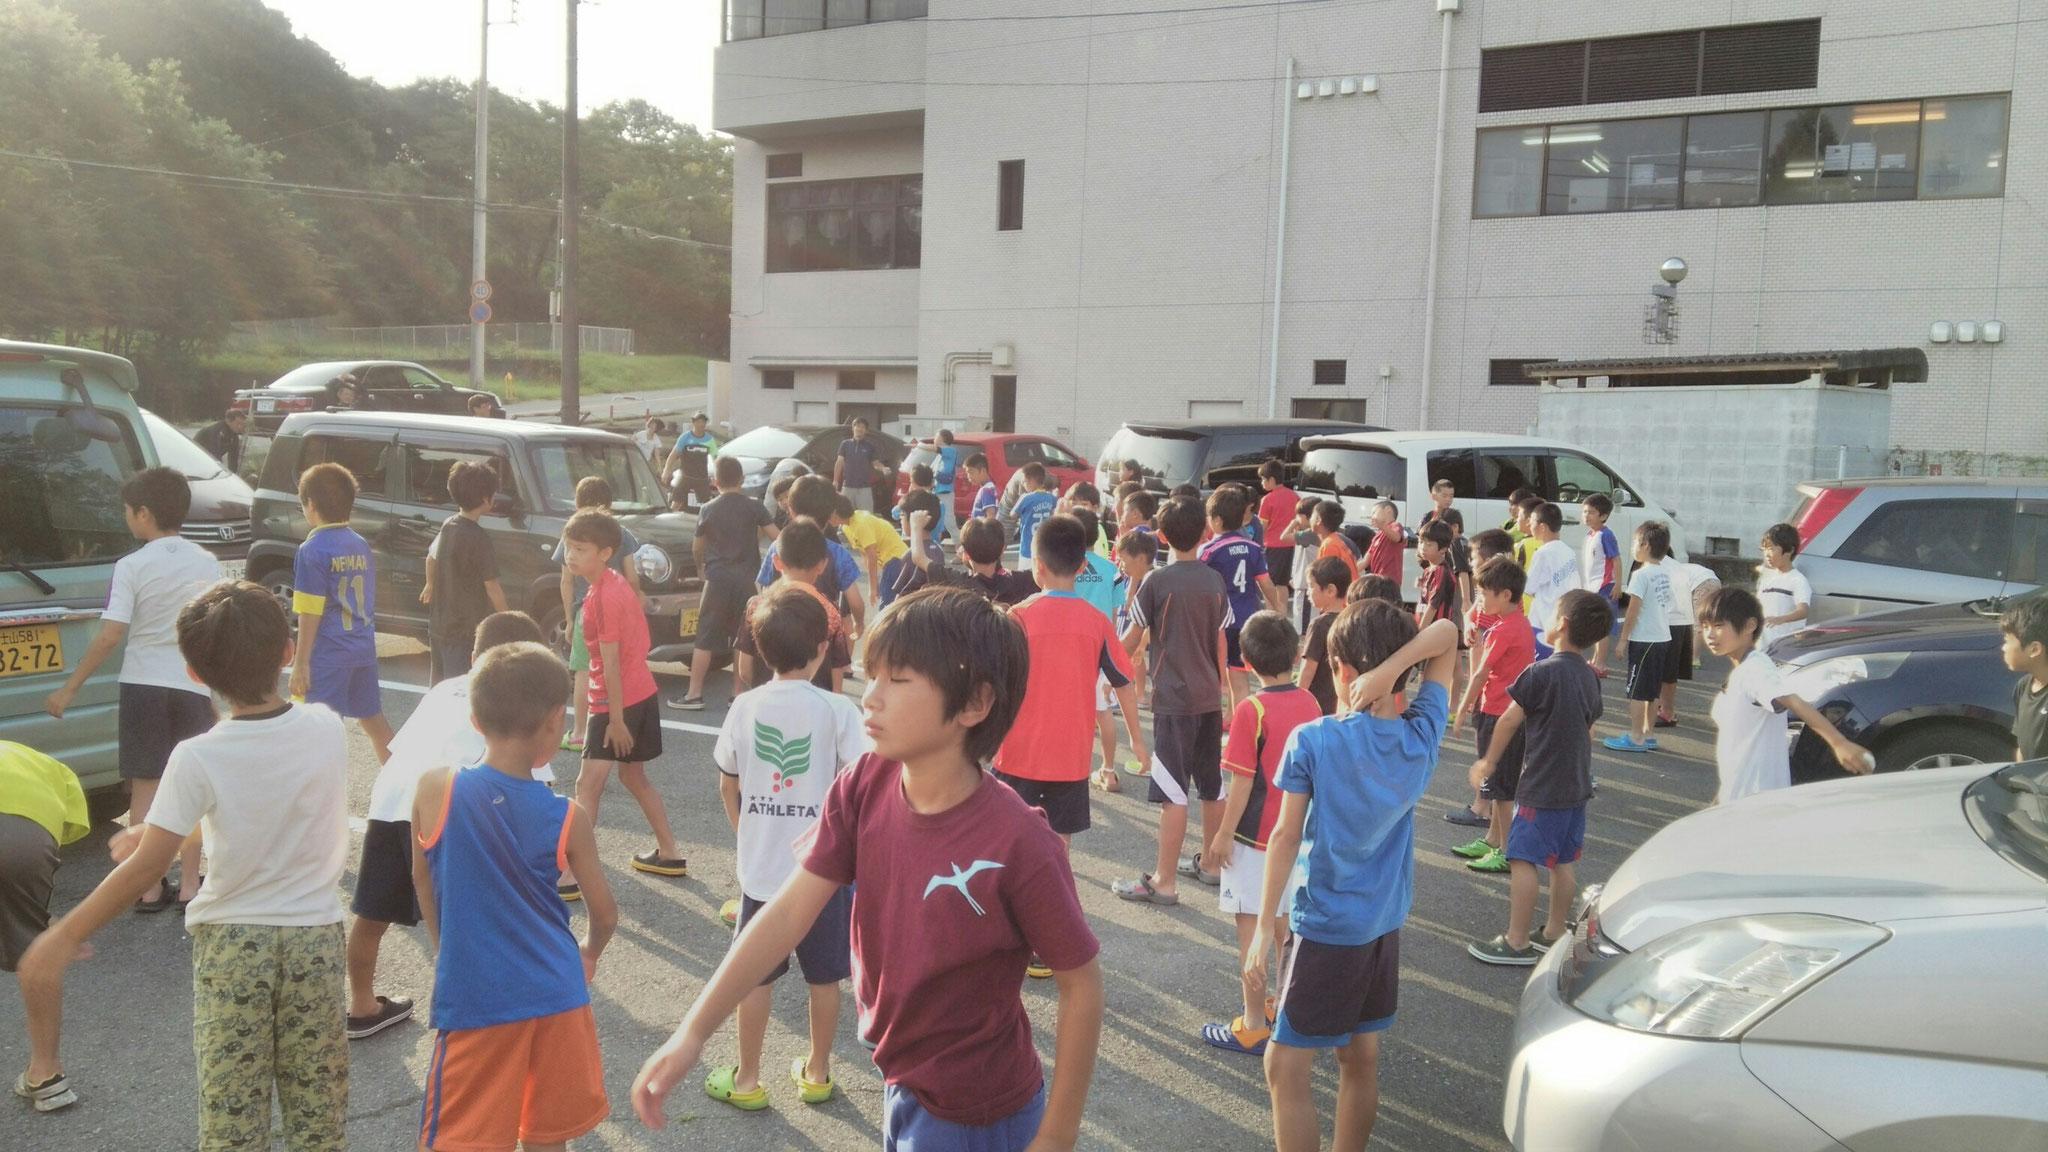 7/24 夏合宿 2日目 朝:ラジオ体操第一、第二